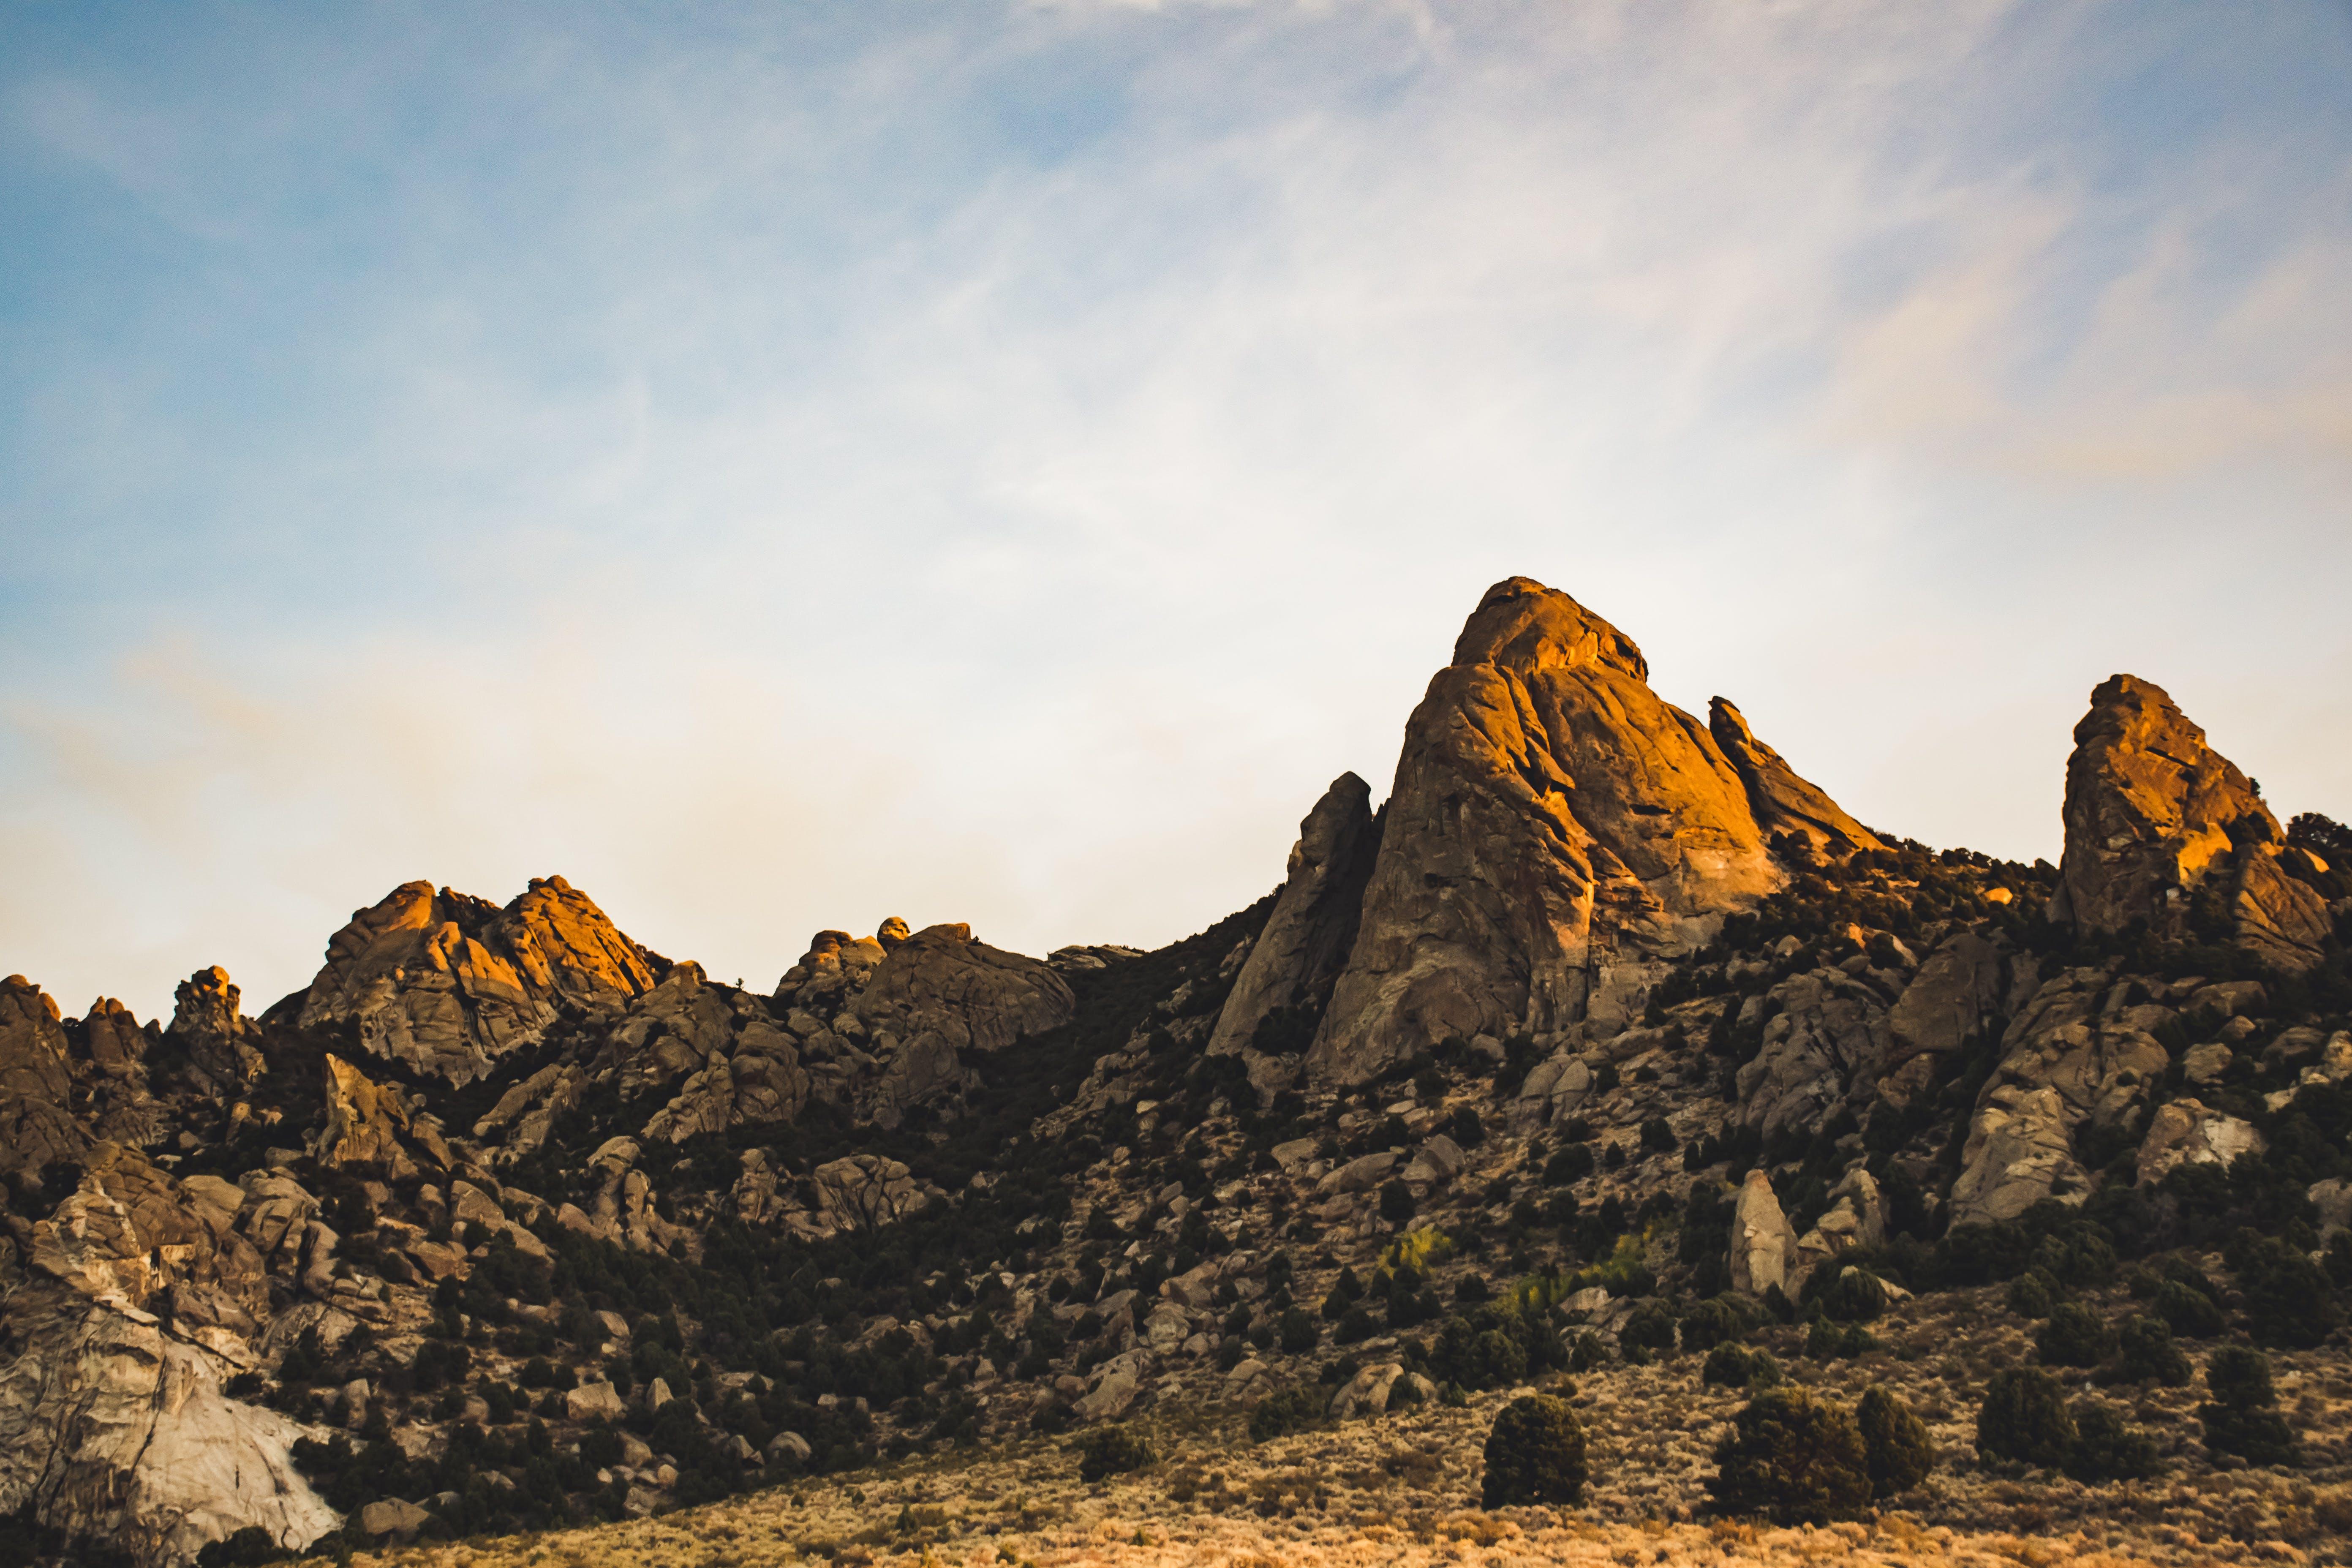 Landscape Photo of Rocks on Mountain